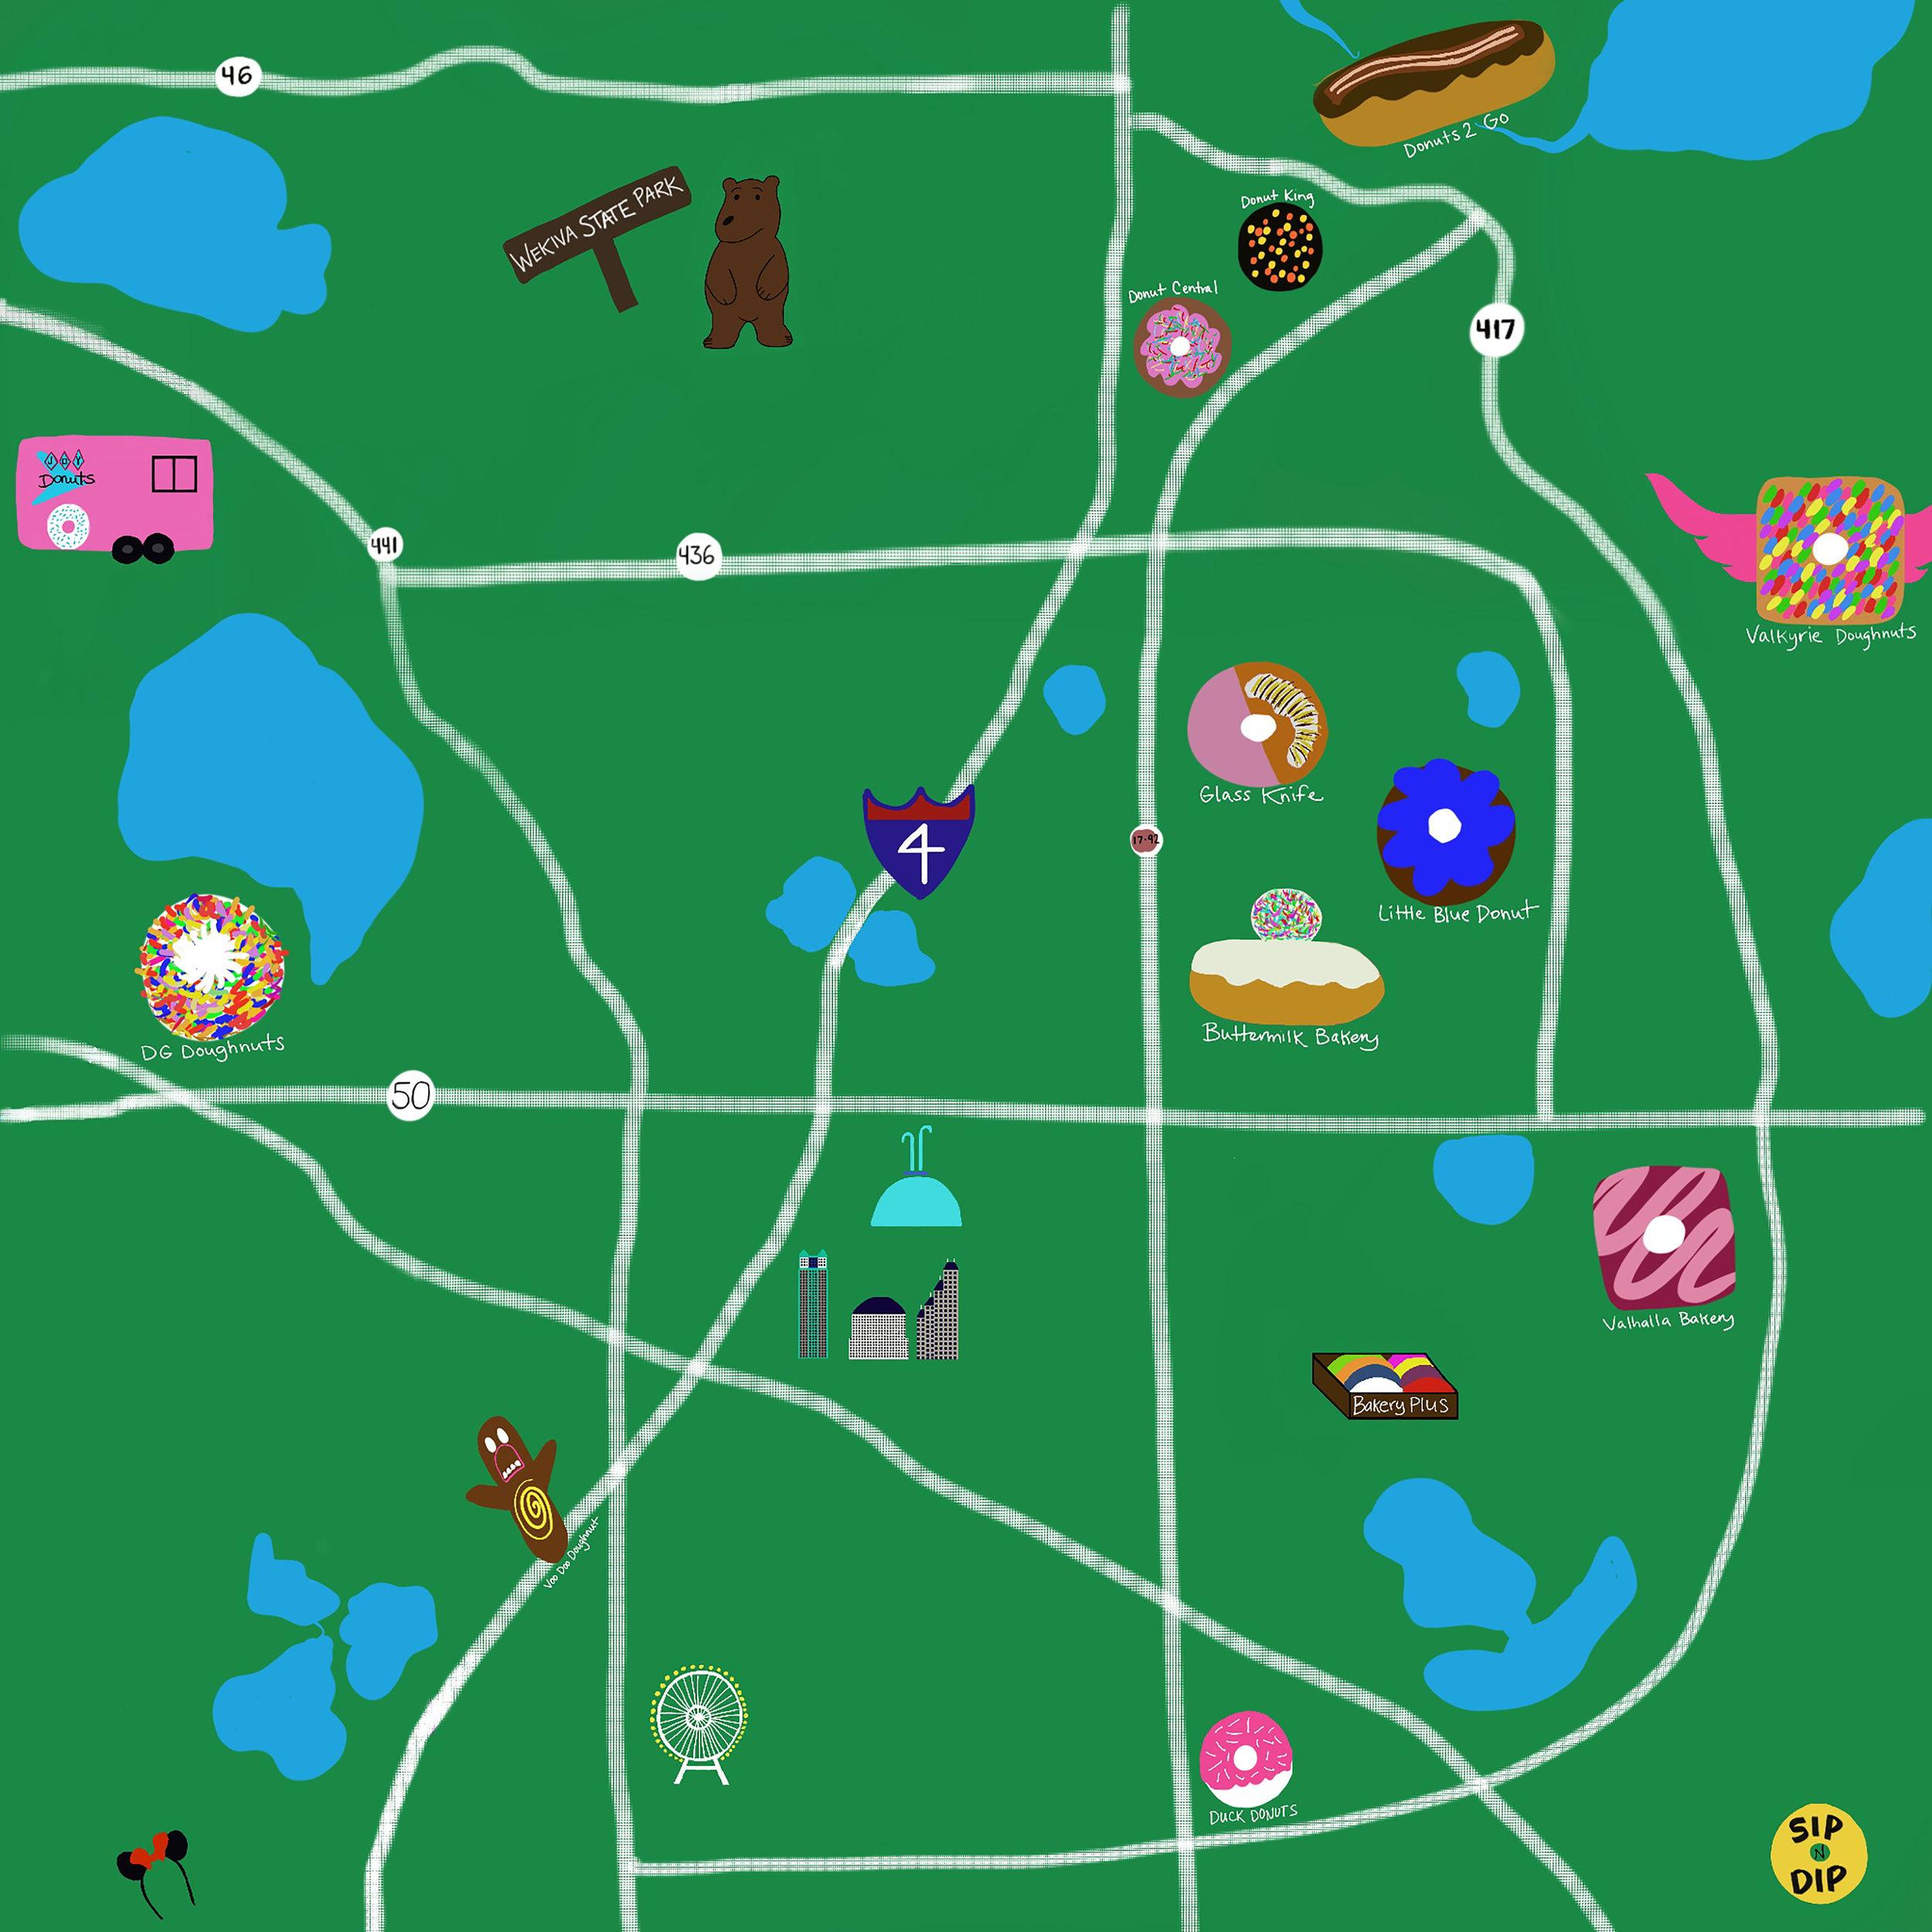 OrlandoDonutMap.jpg